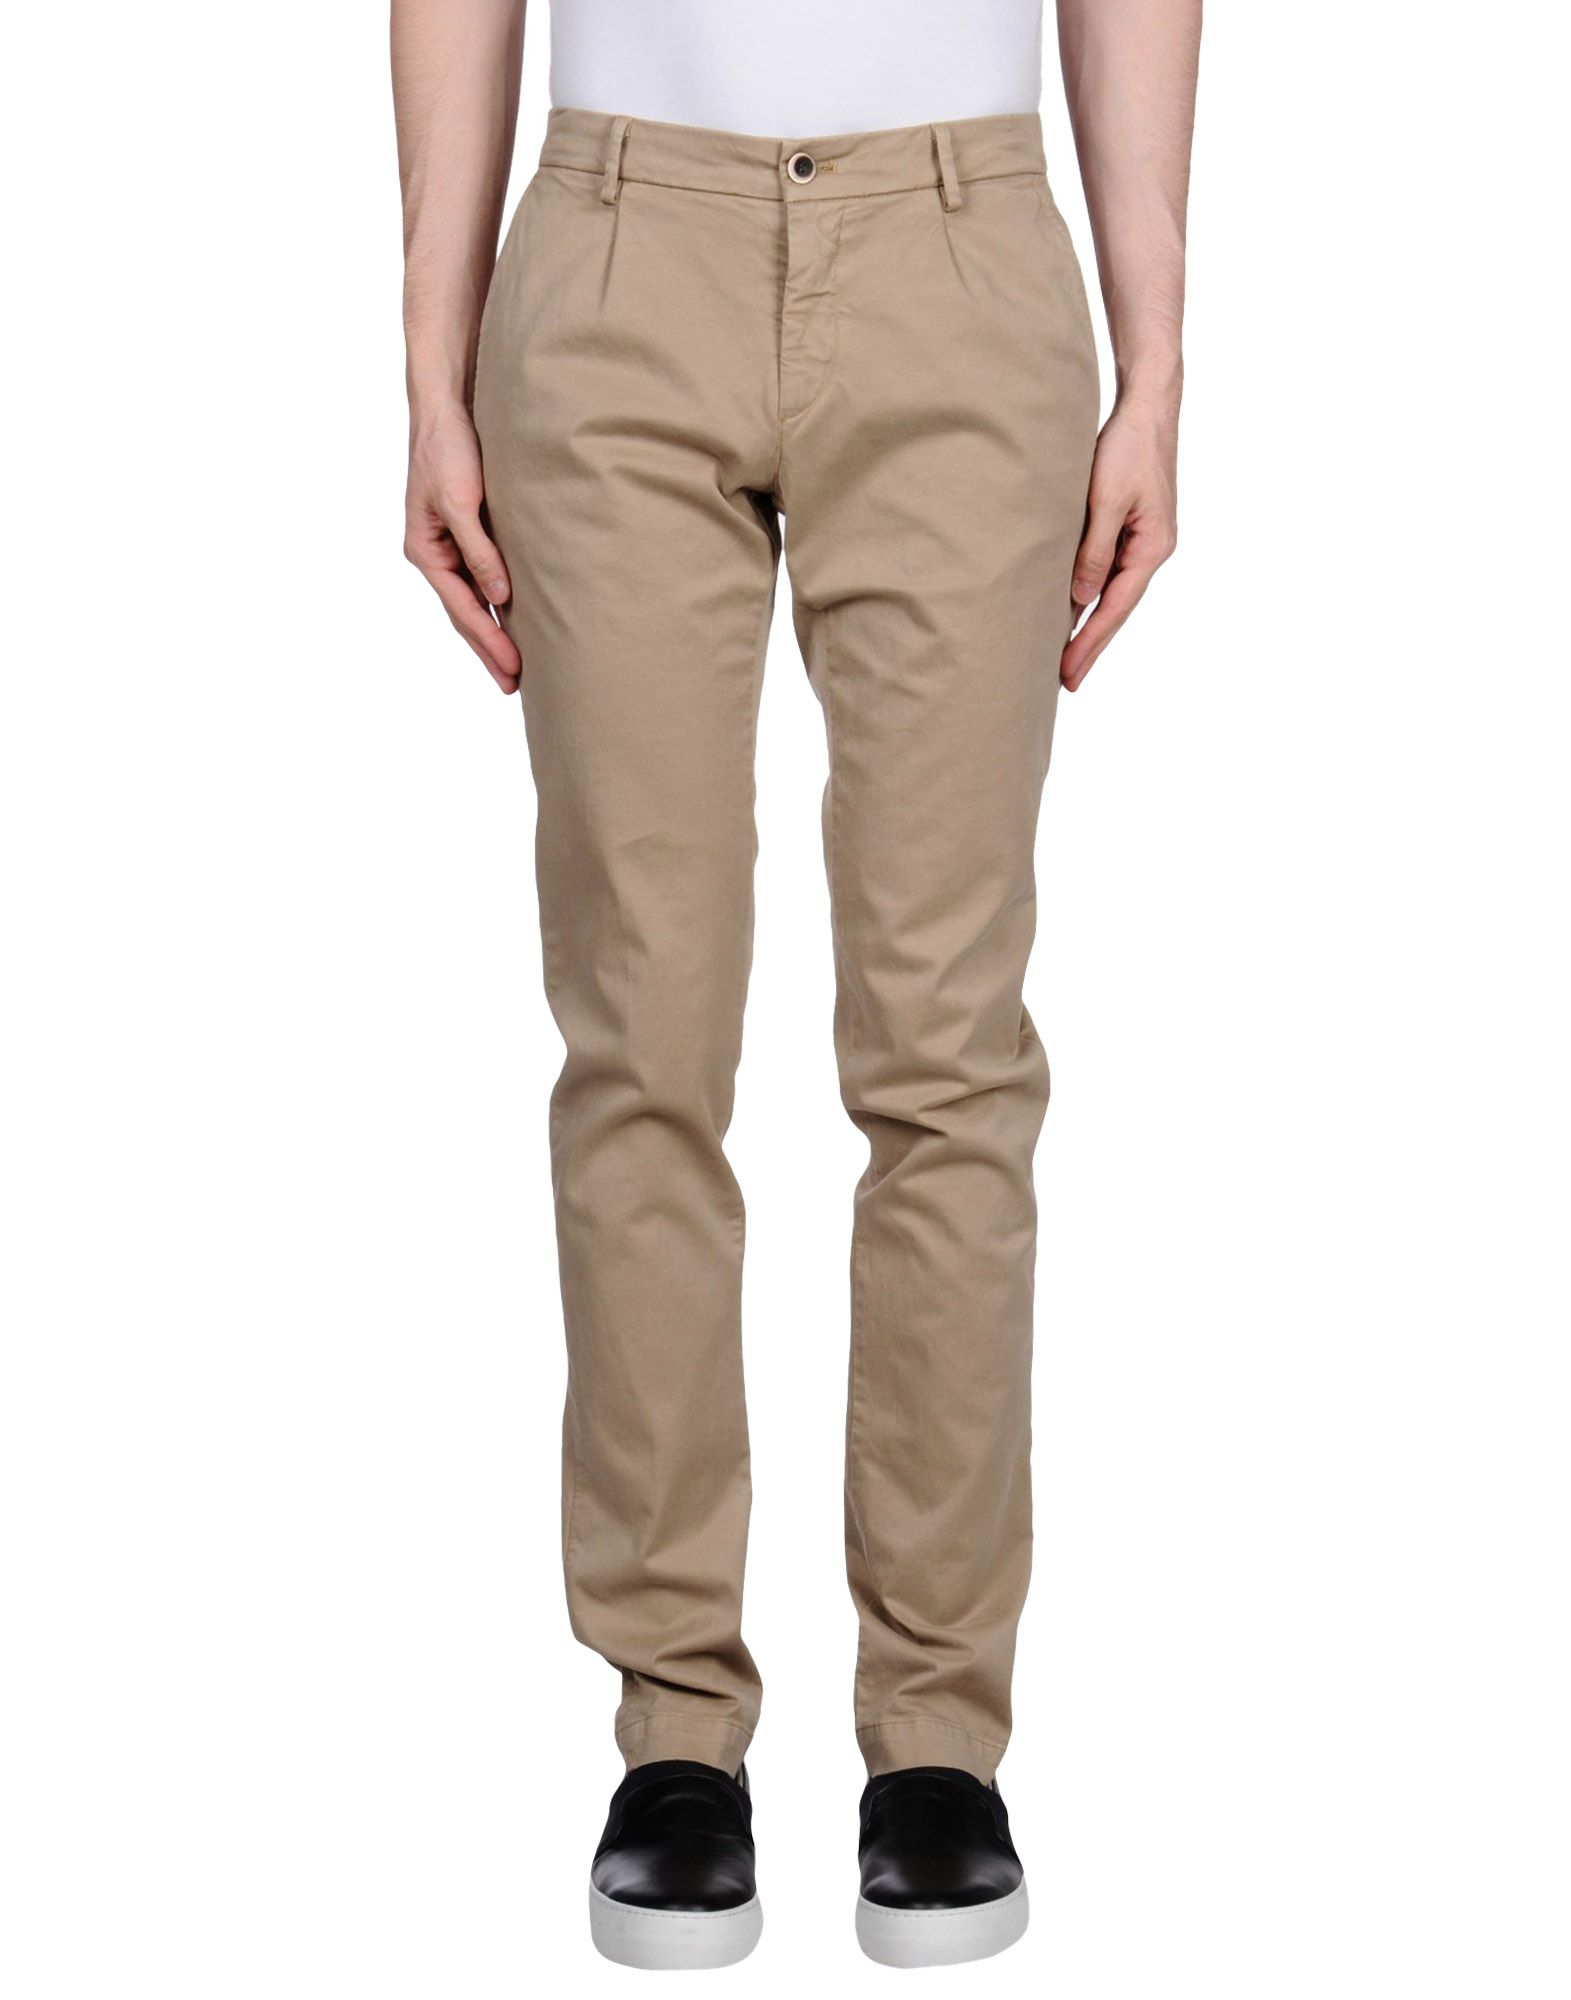 PANTALONES - Pantalones THIRD DENIM LTD. Ewfp402py